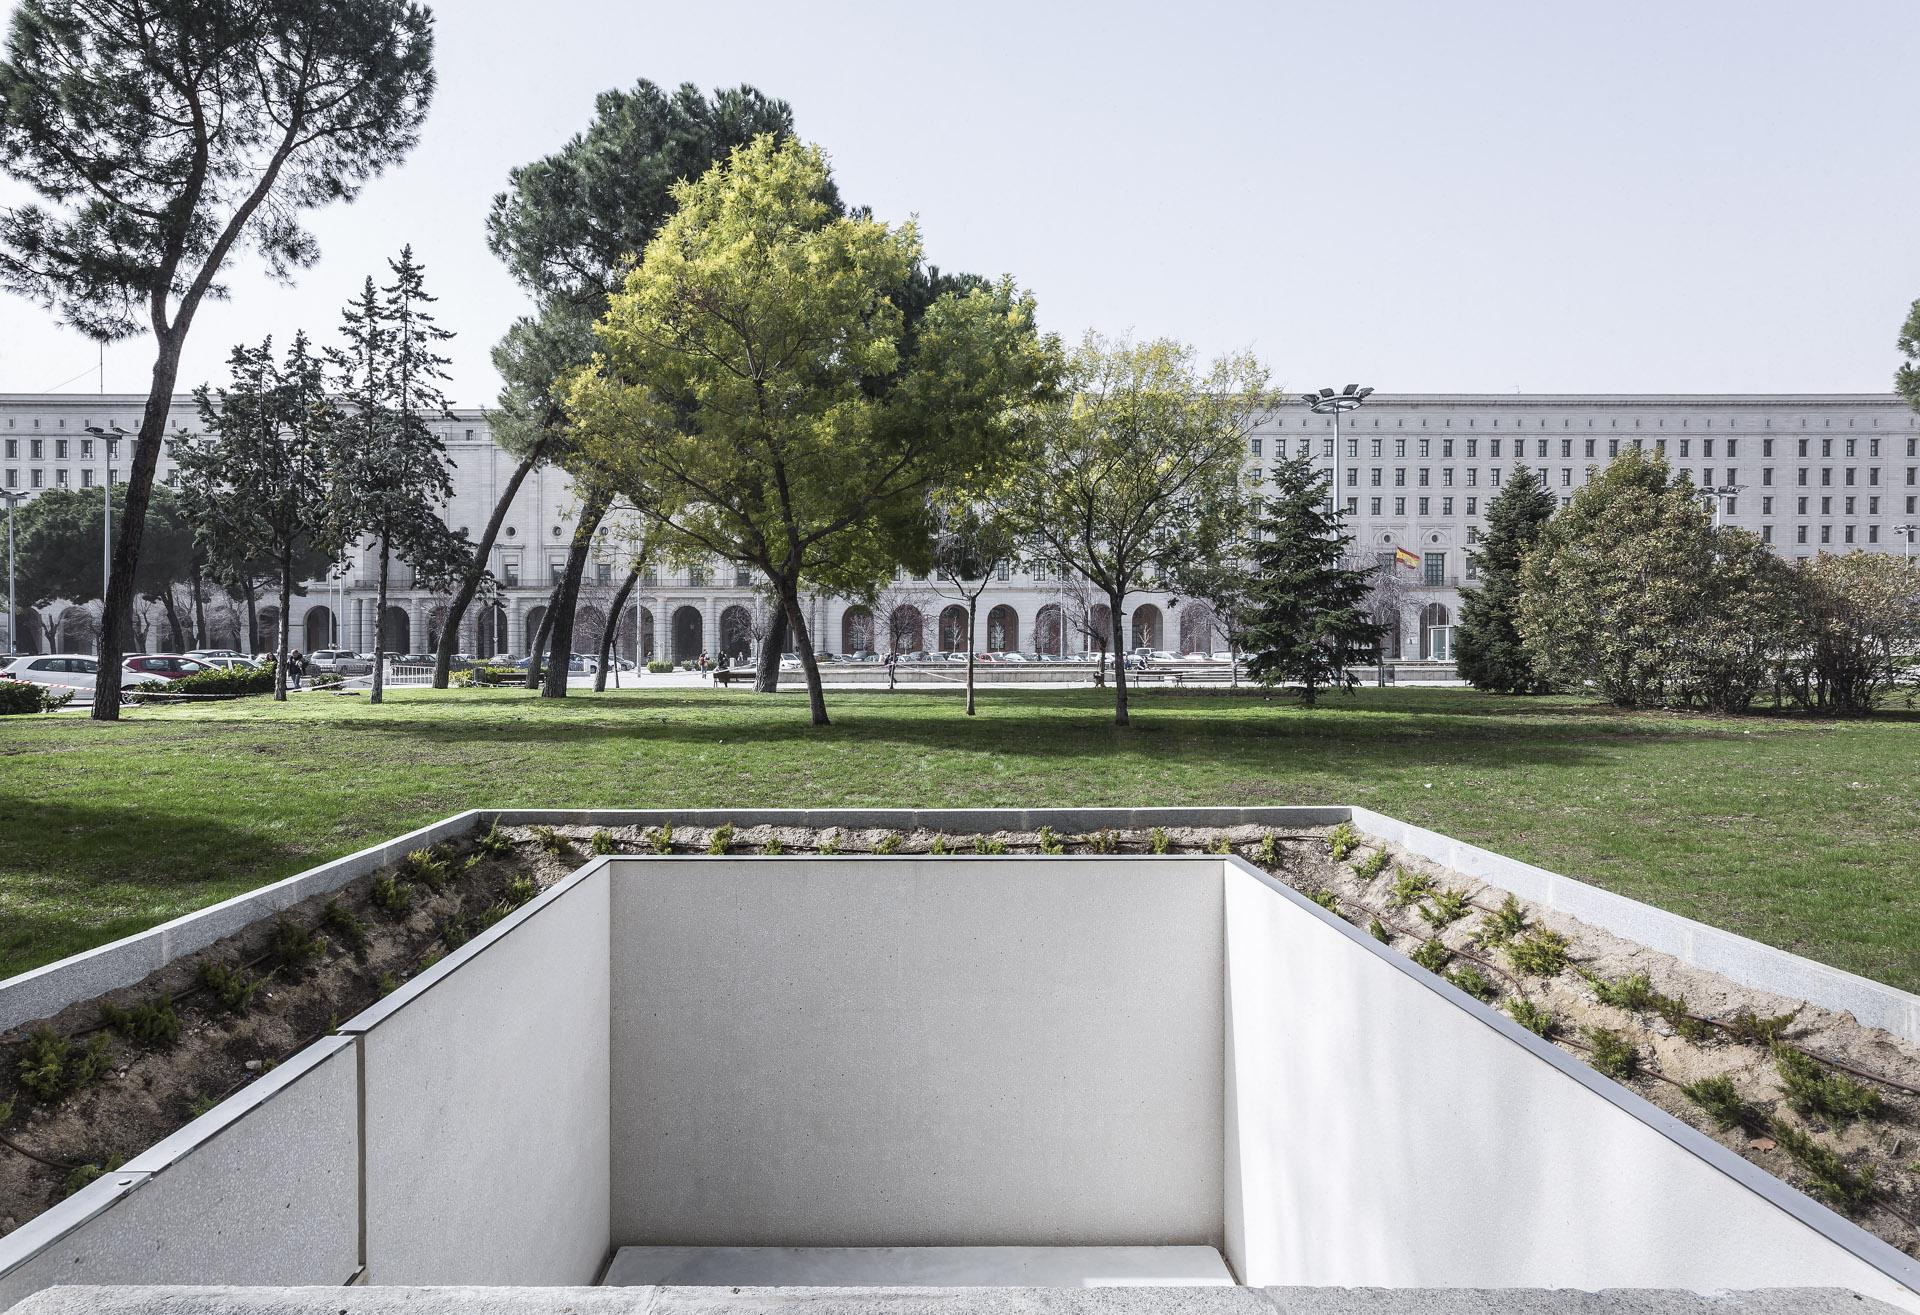 fotografia-arquitectura-madrid-nuevos-ministerios-elorza-german-cabo-06